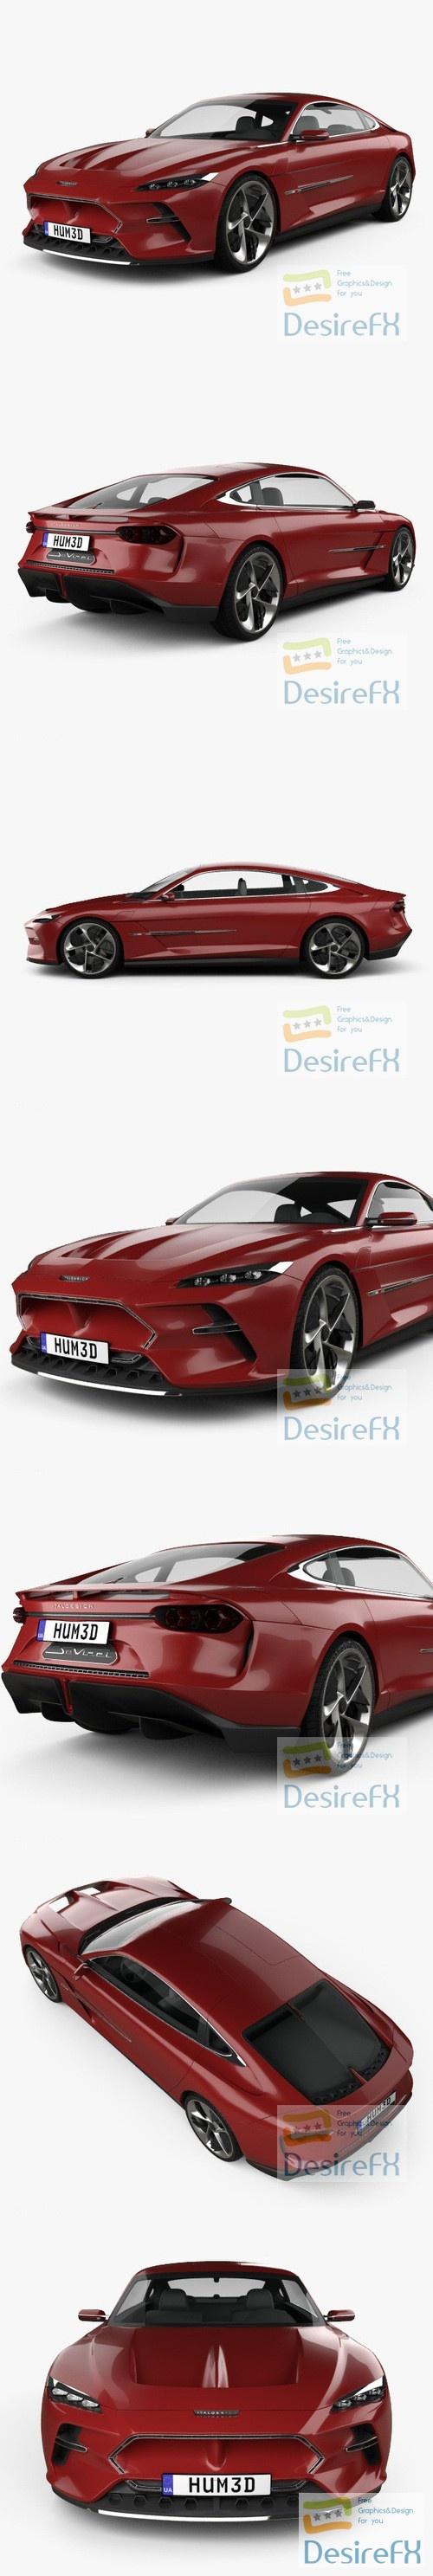 Italdesign DaVinci 2020 3D Model